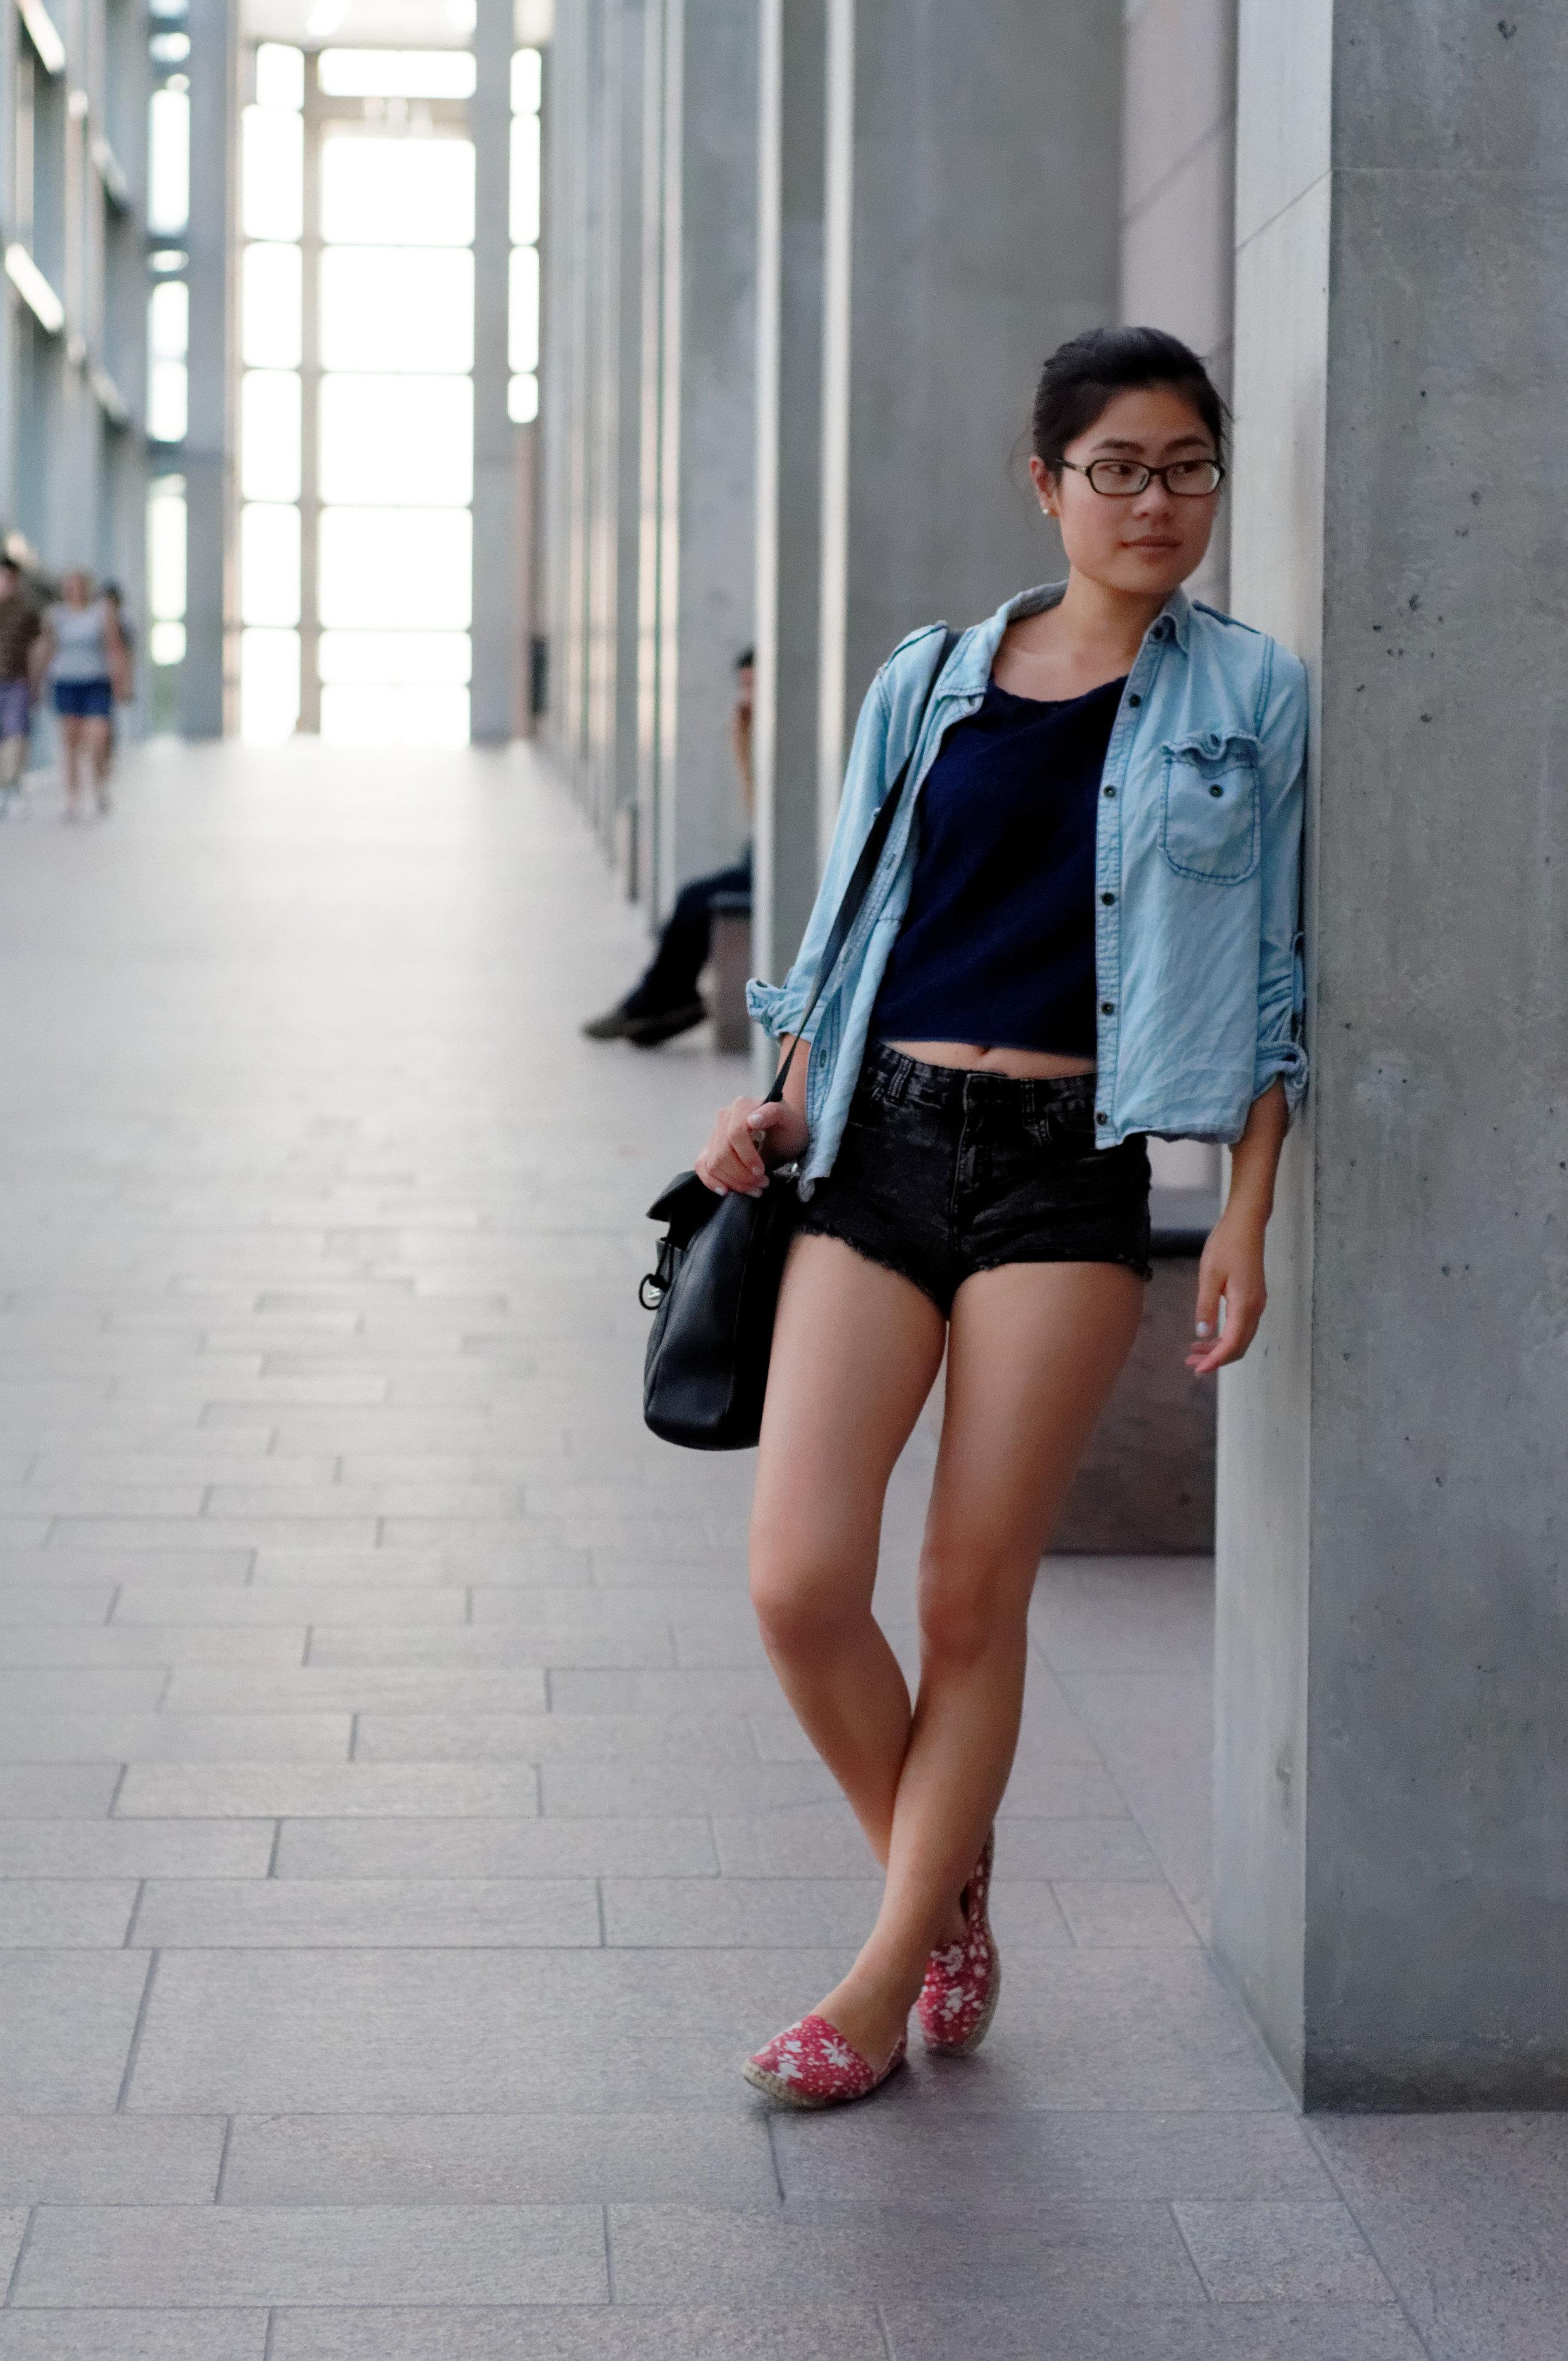 student chic